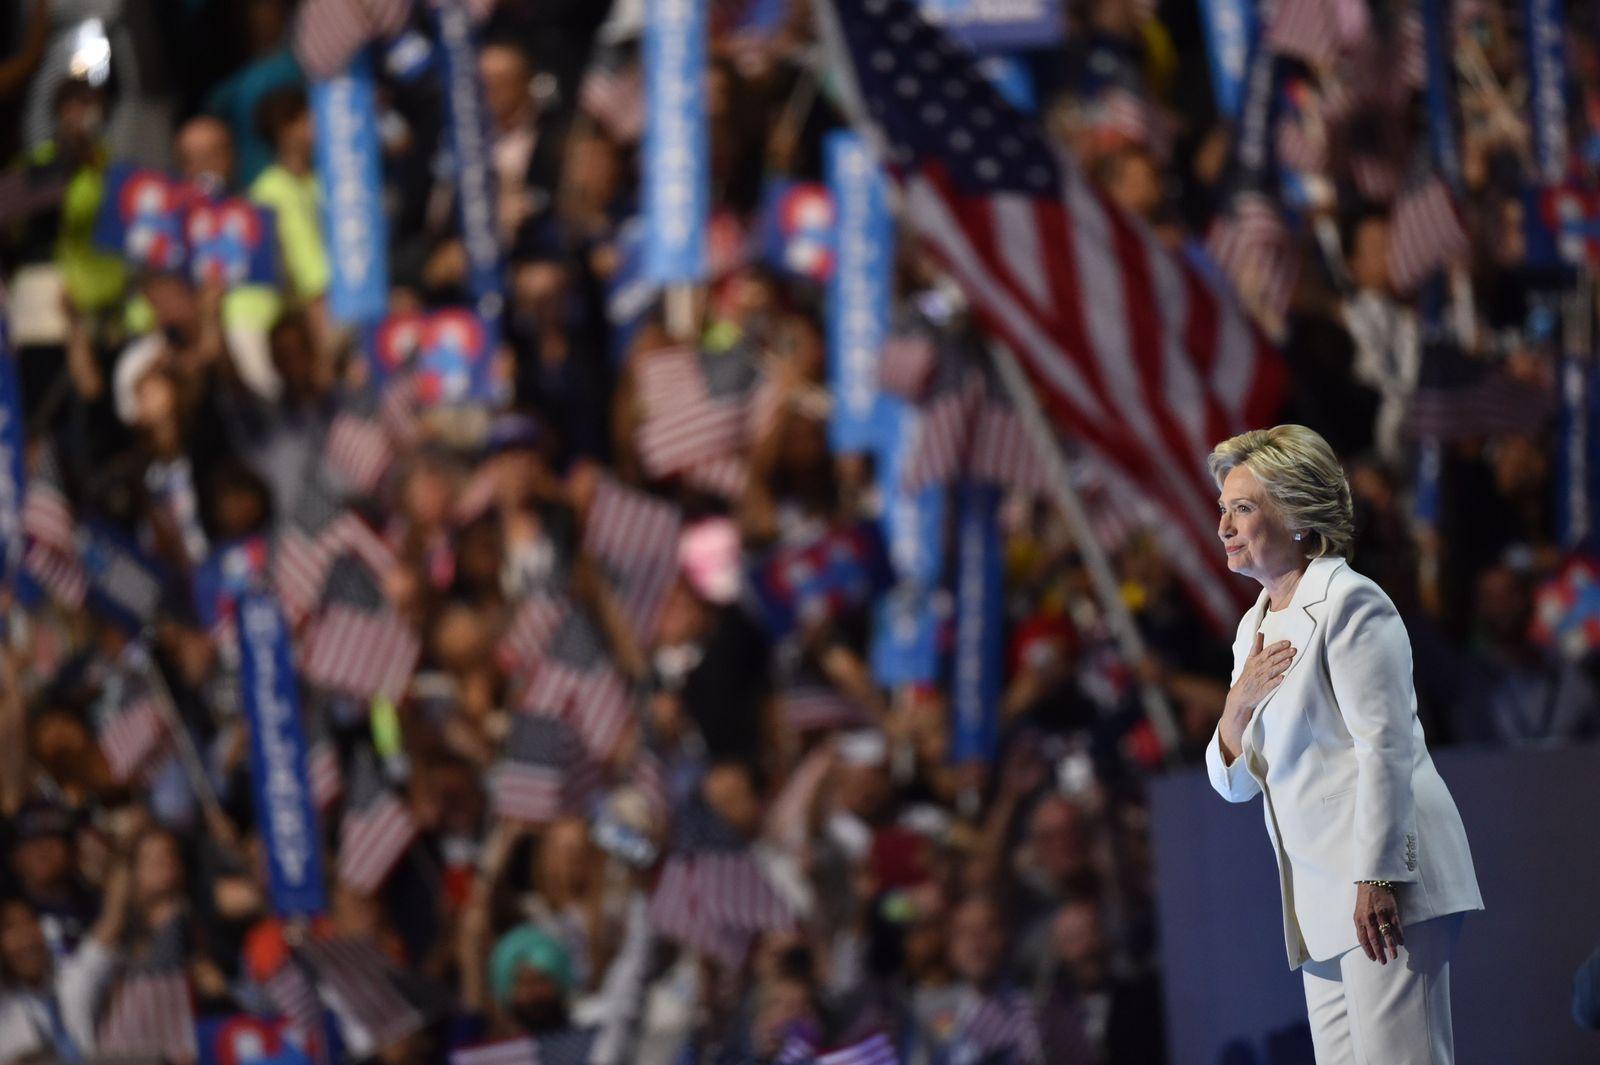 Hillary Clinton / Philadelphia